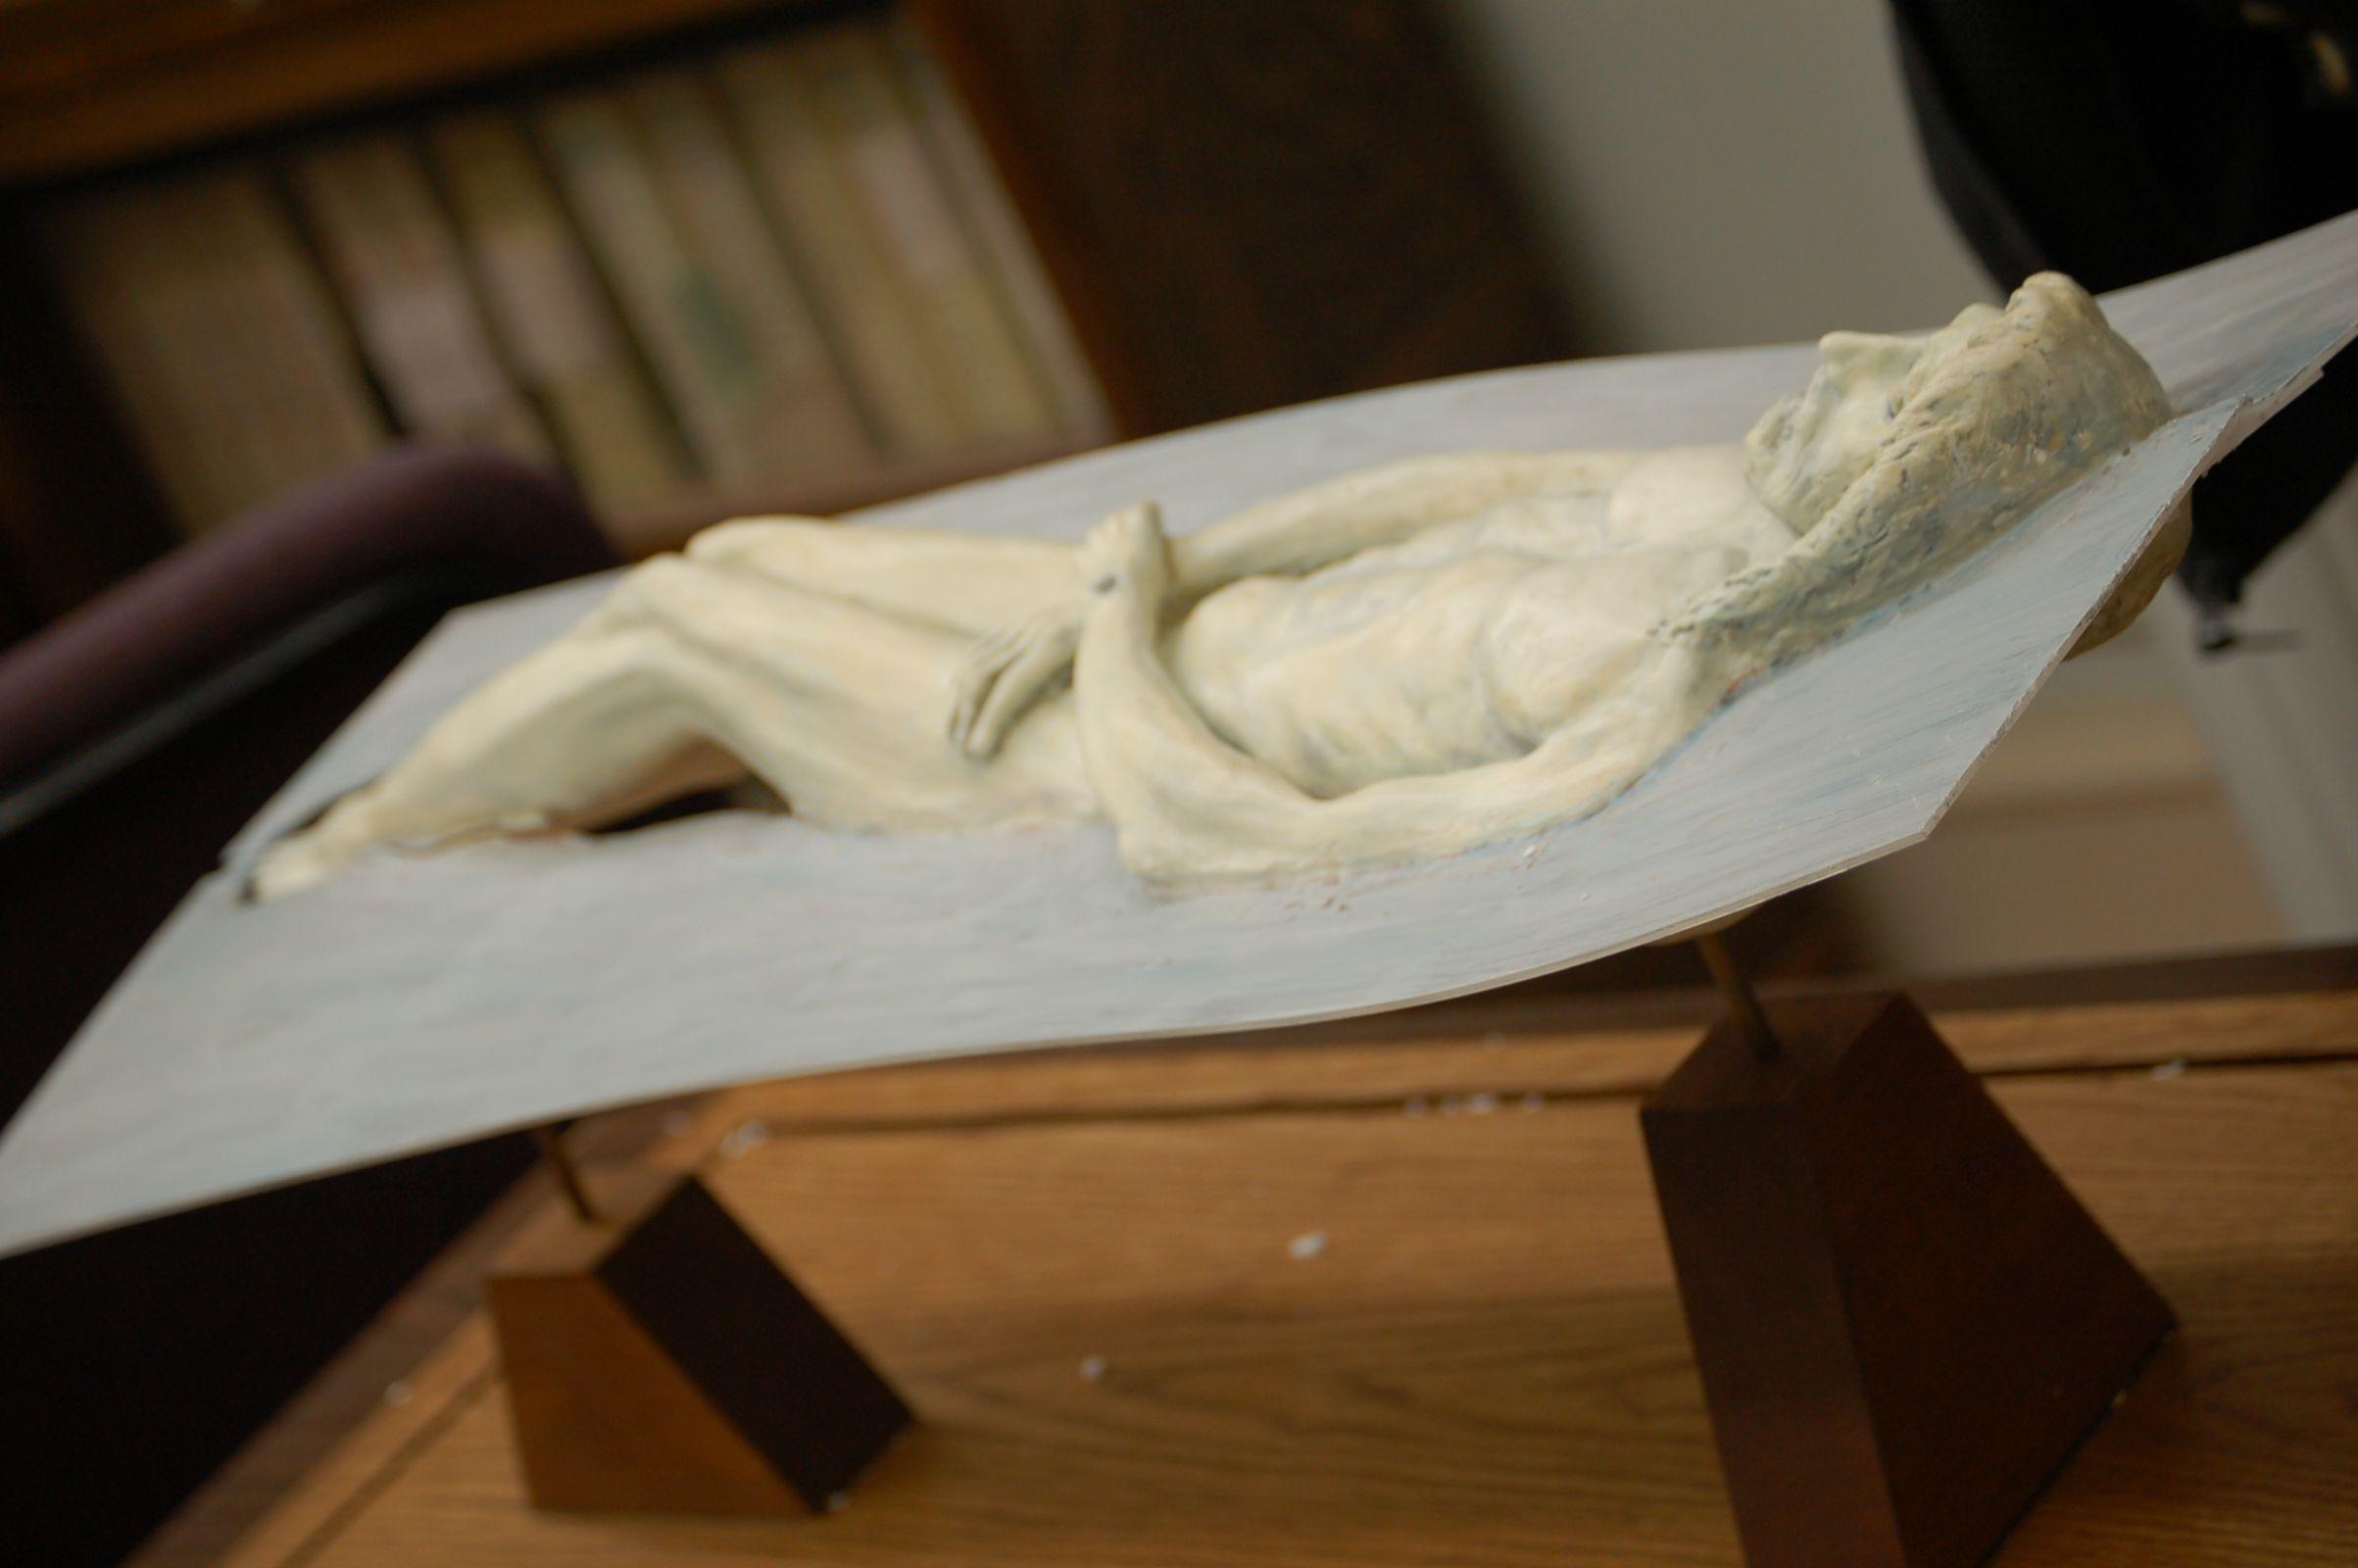 Photo 12. Event Horizon shown in Sculpture of Christ